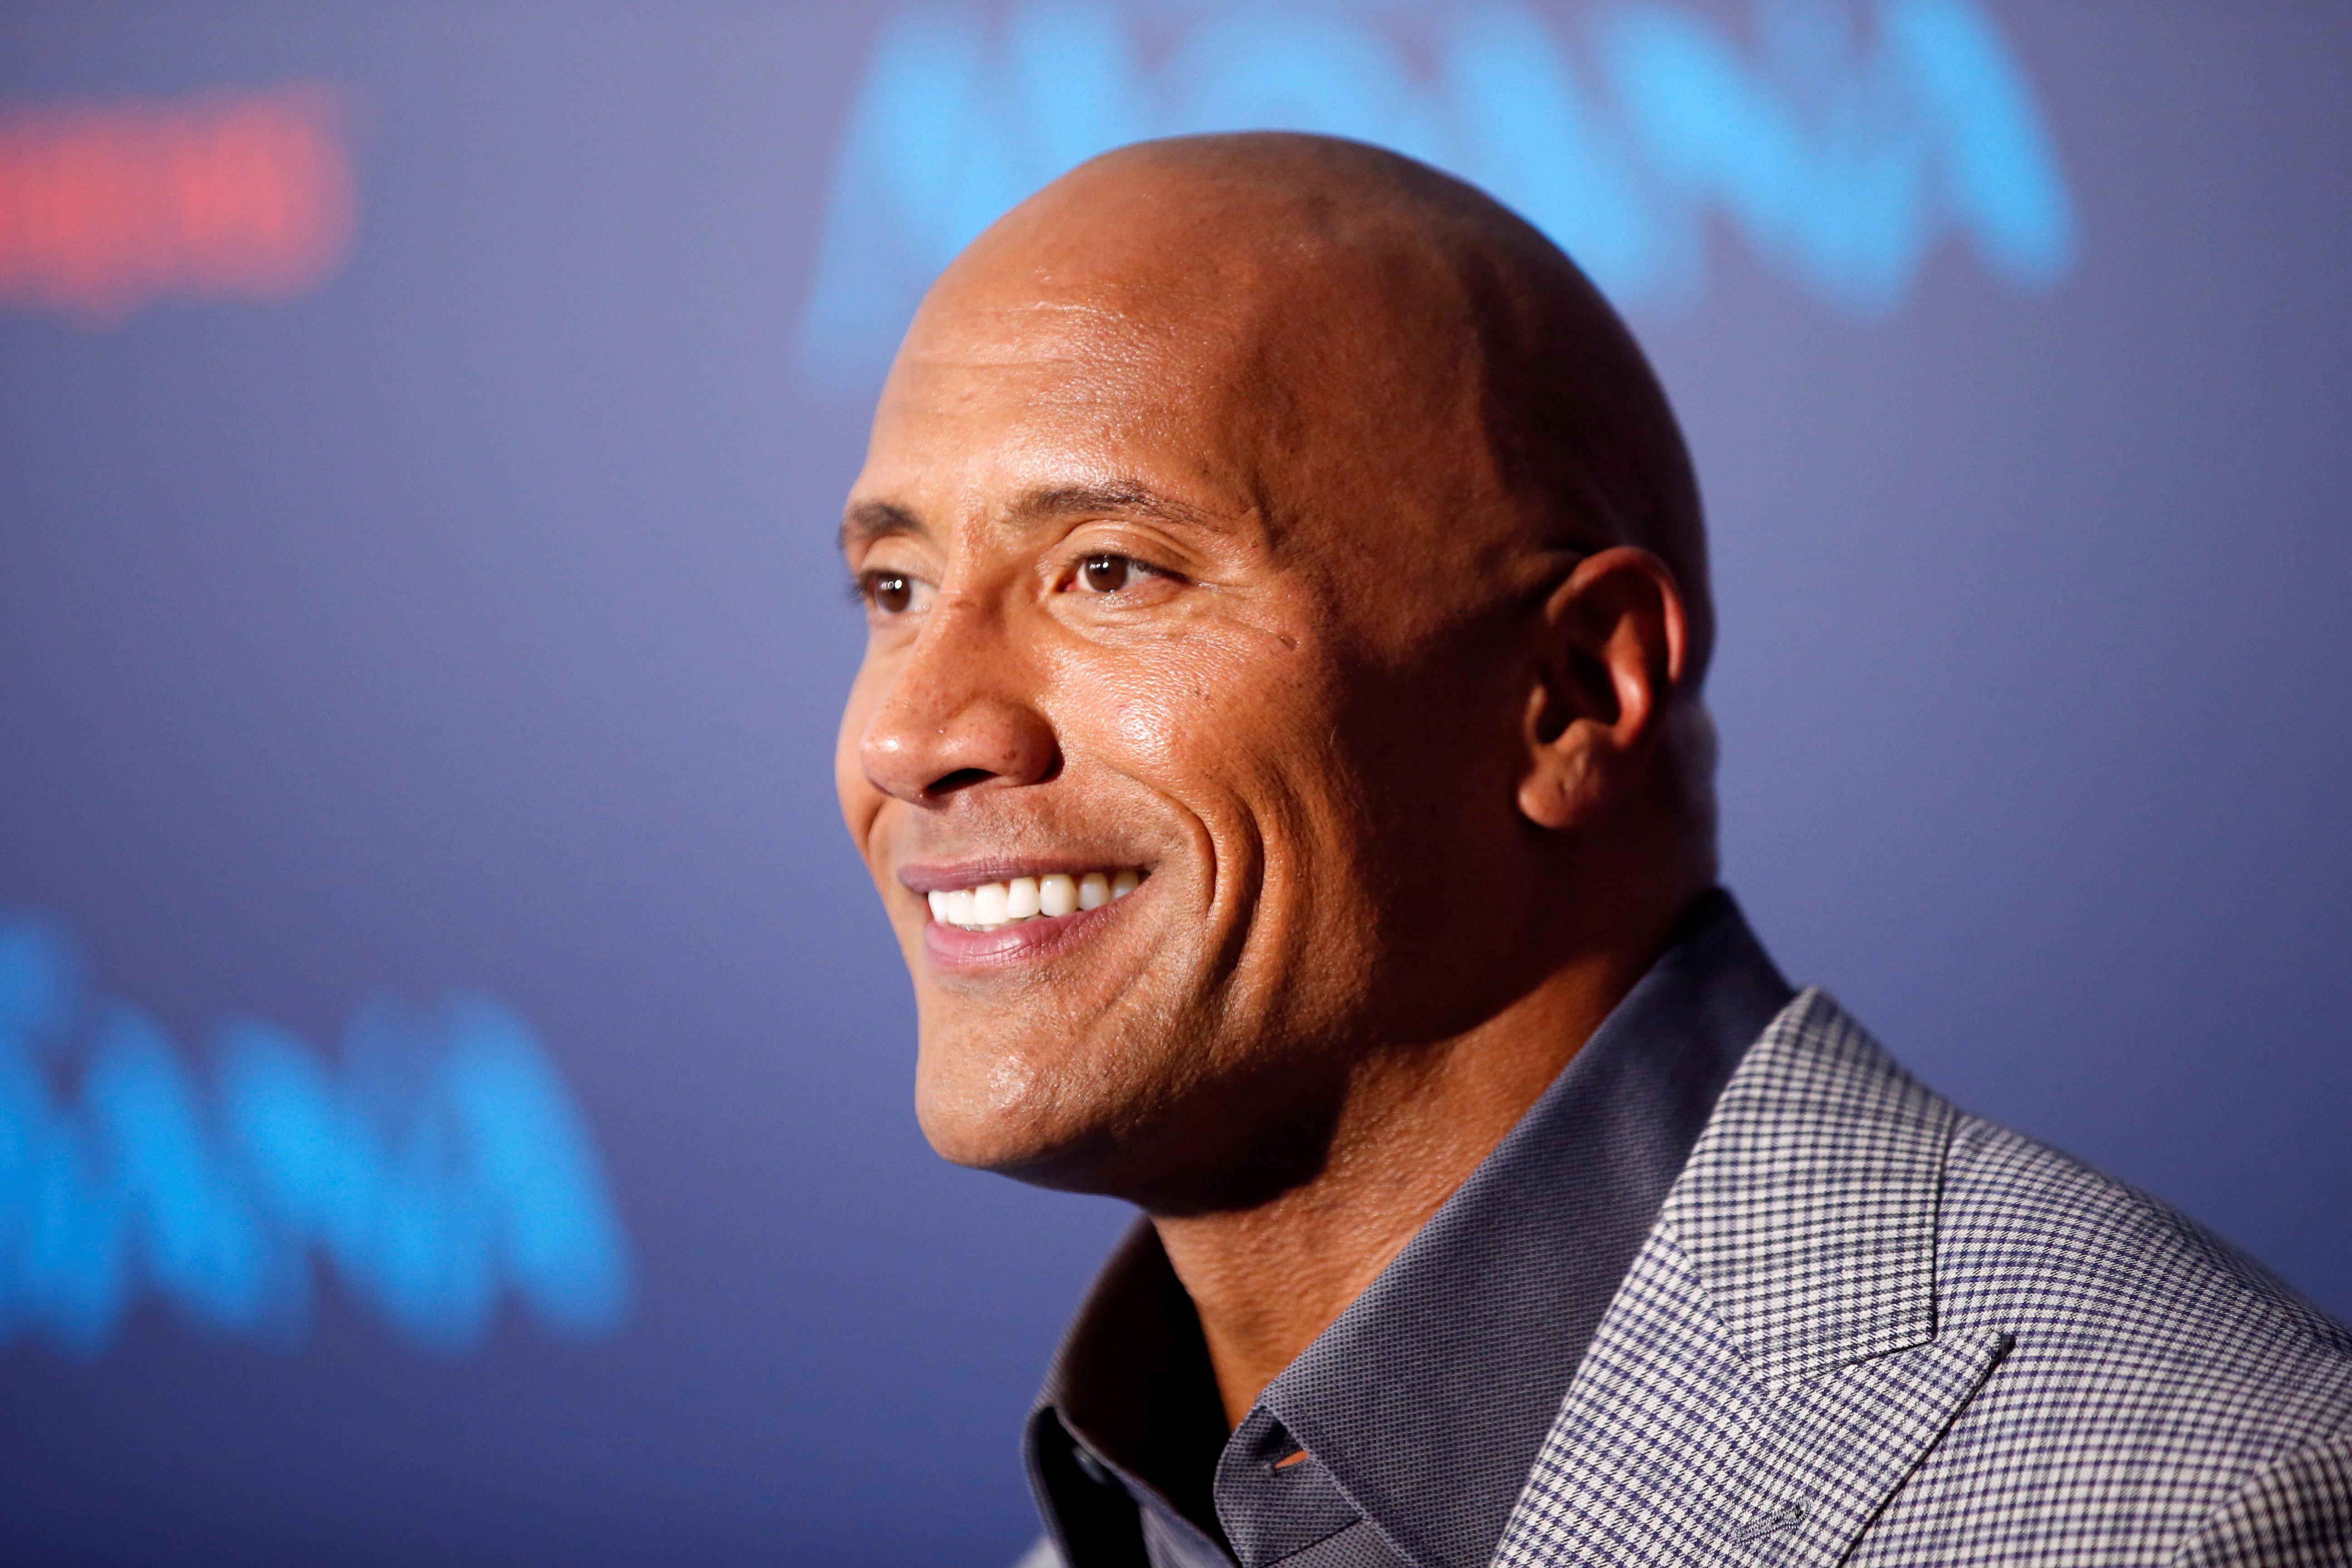 Dwayne 'The Rock' Johnson's New Movie Poster Baffles Fans Online